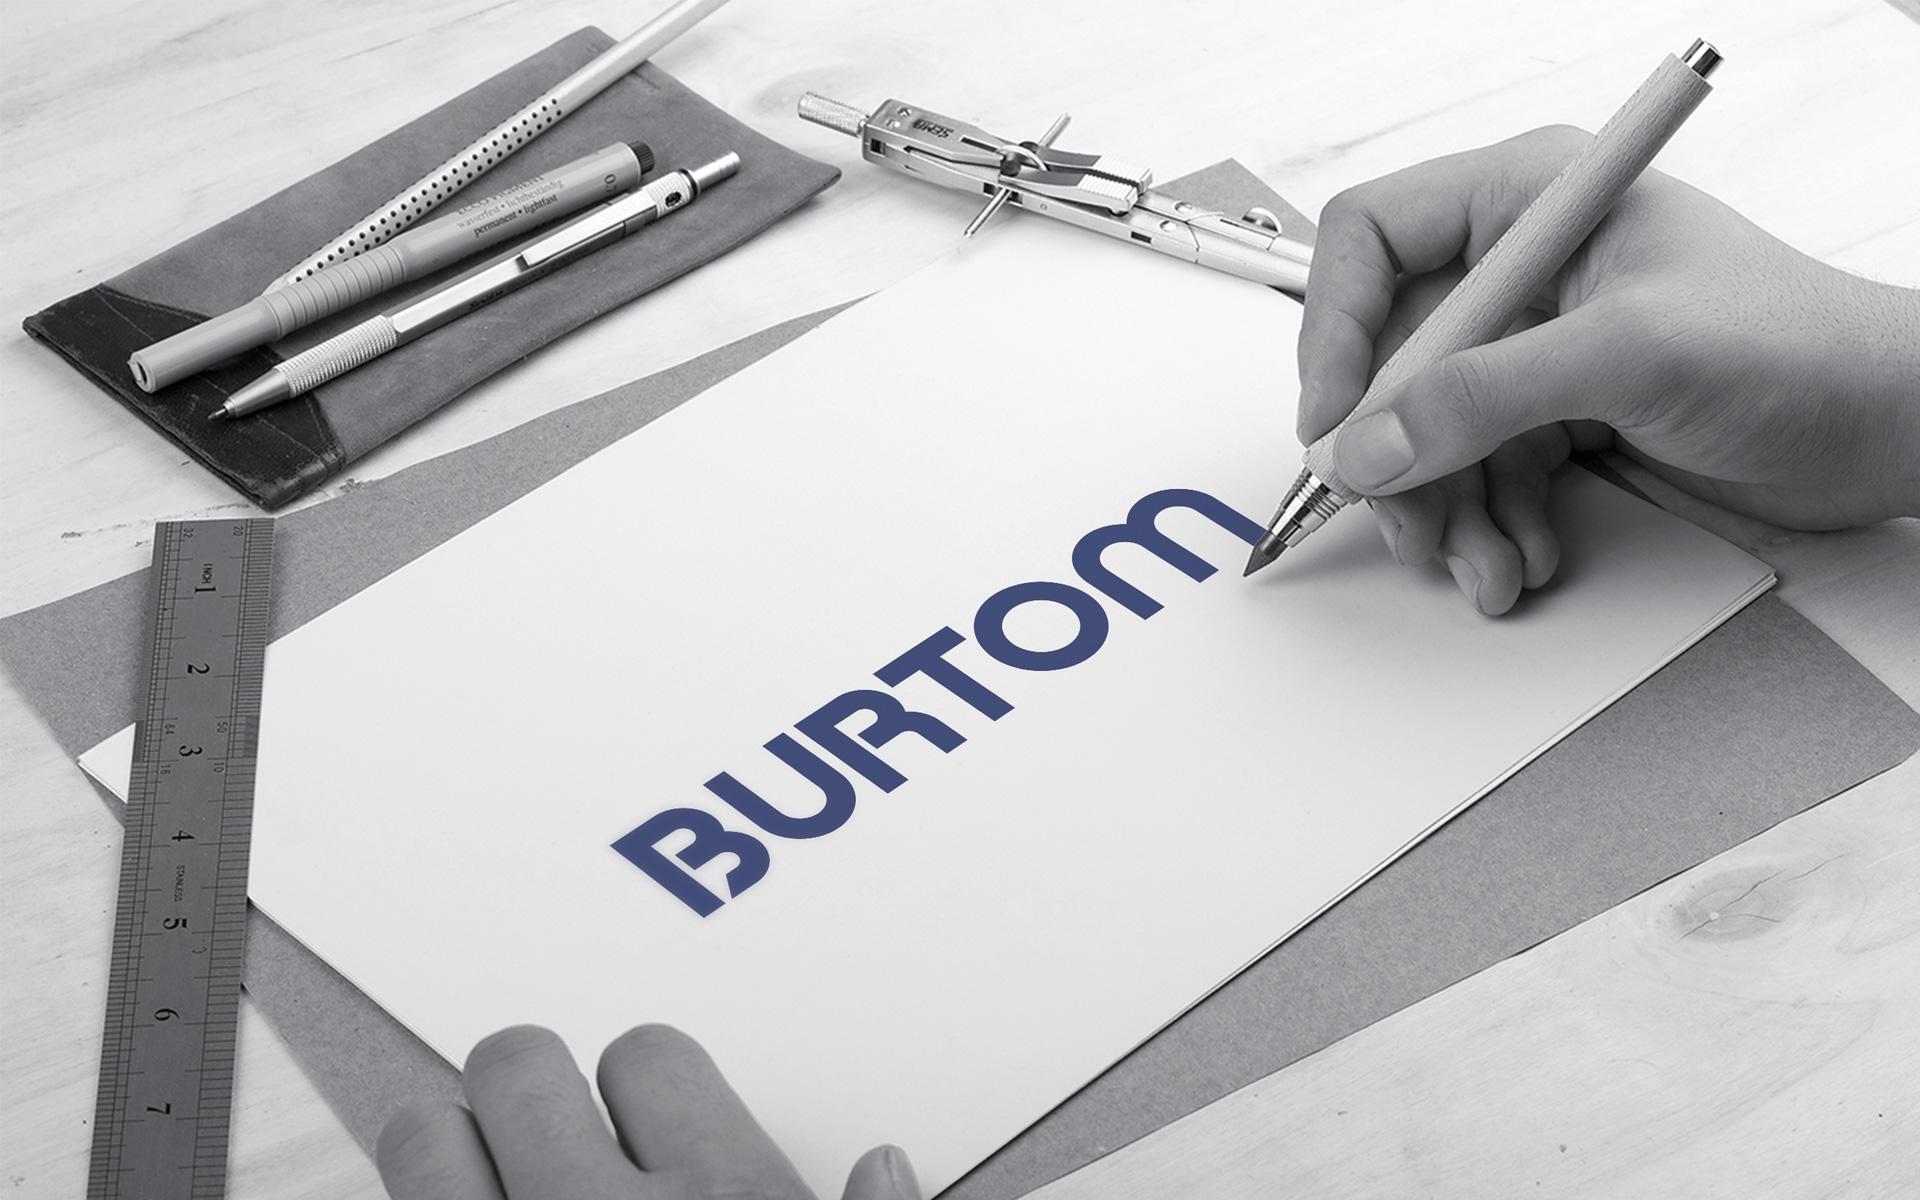 BURTOM